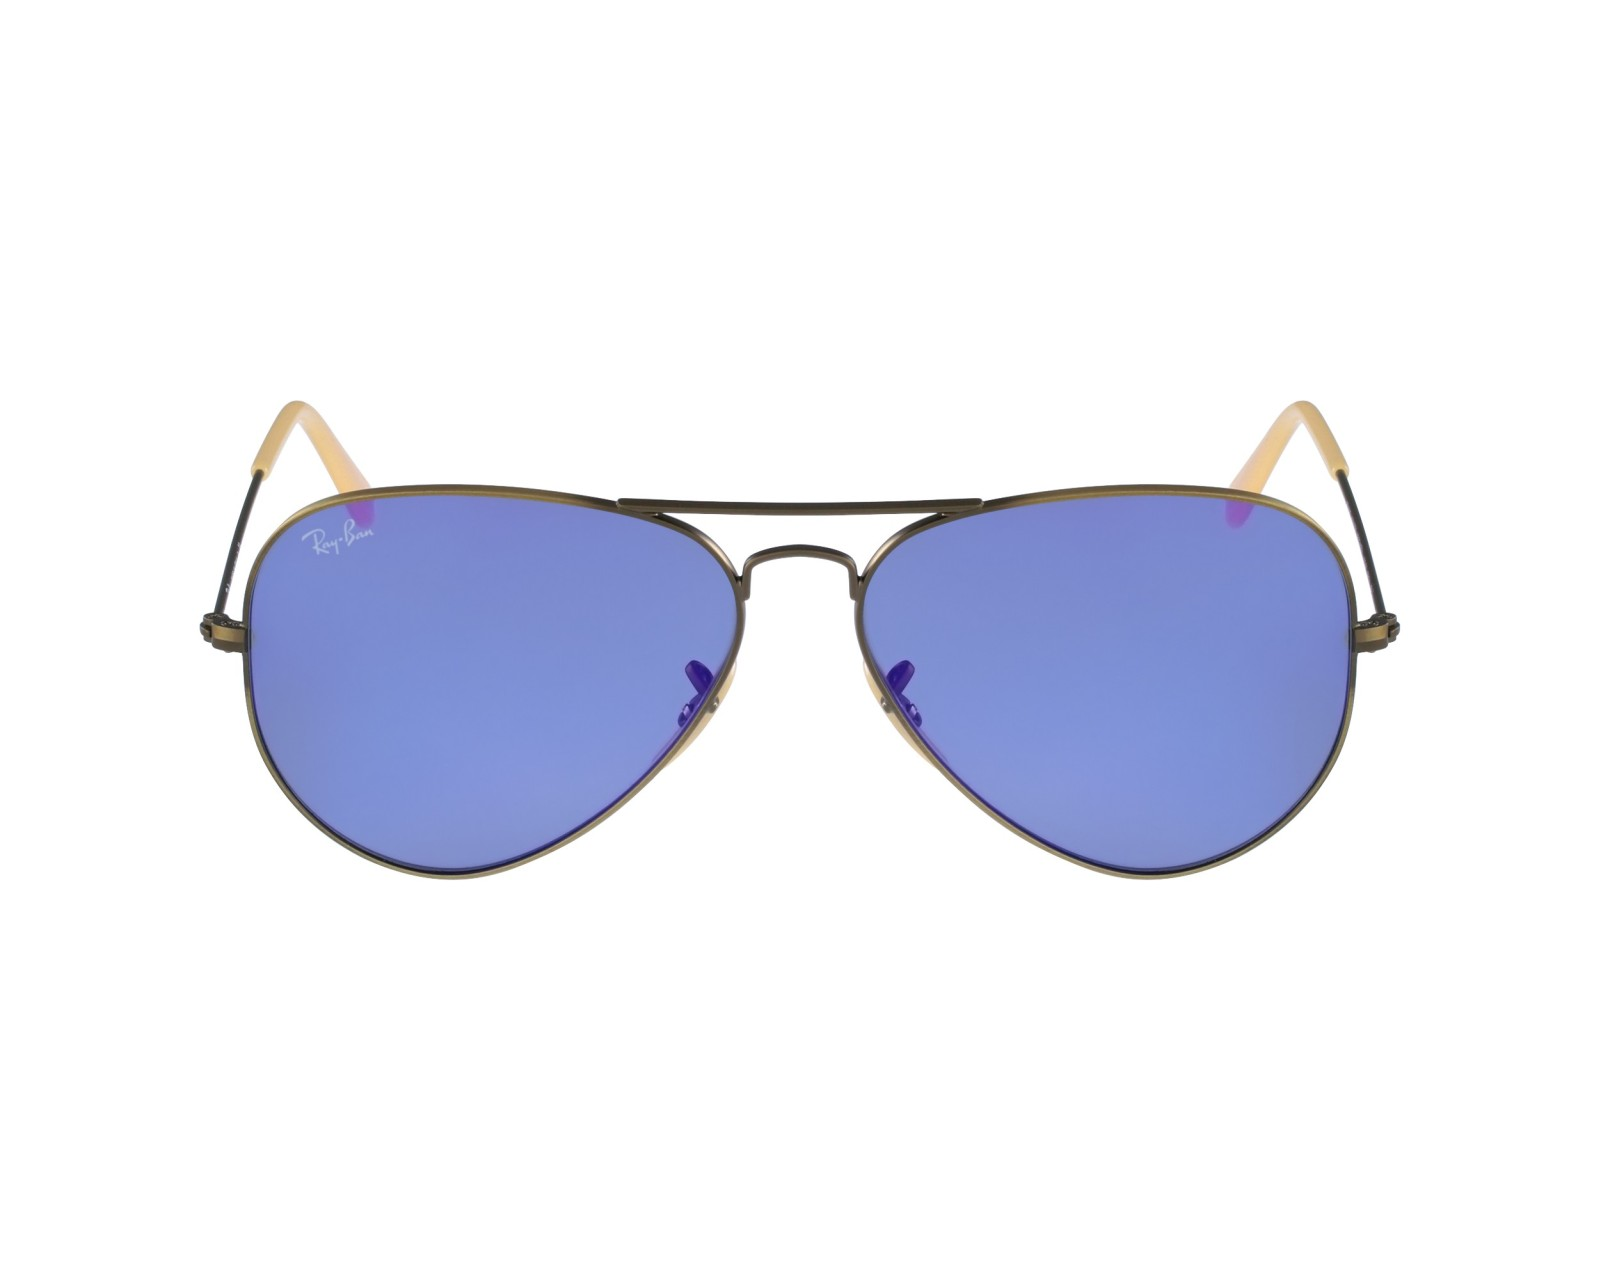 54105d3f1c Ray Ban Polarized Sunglasses Model No Rb 3217 58 « Heritage Malta